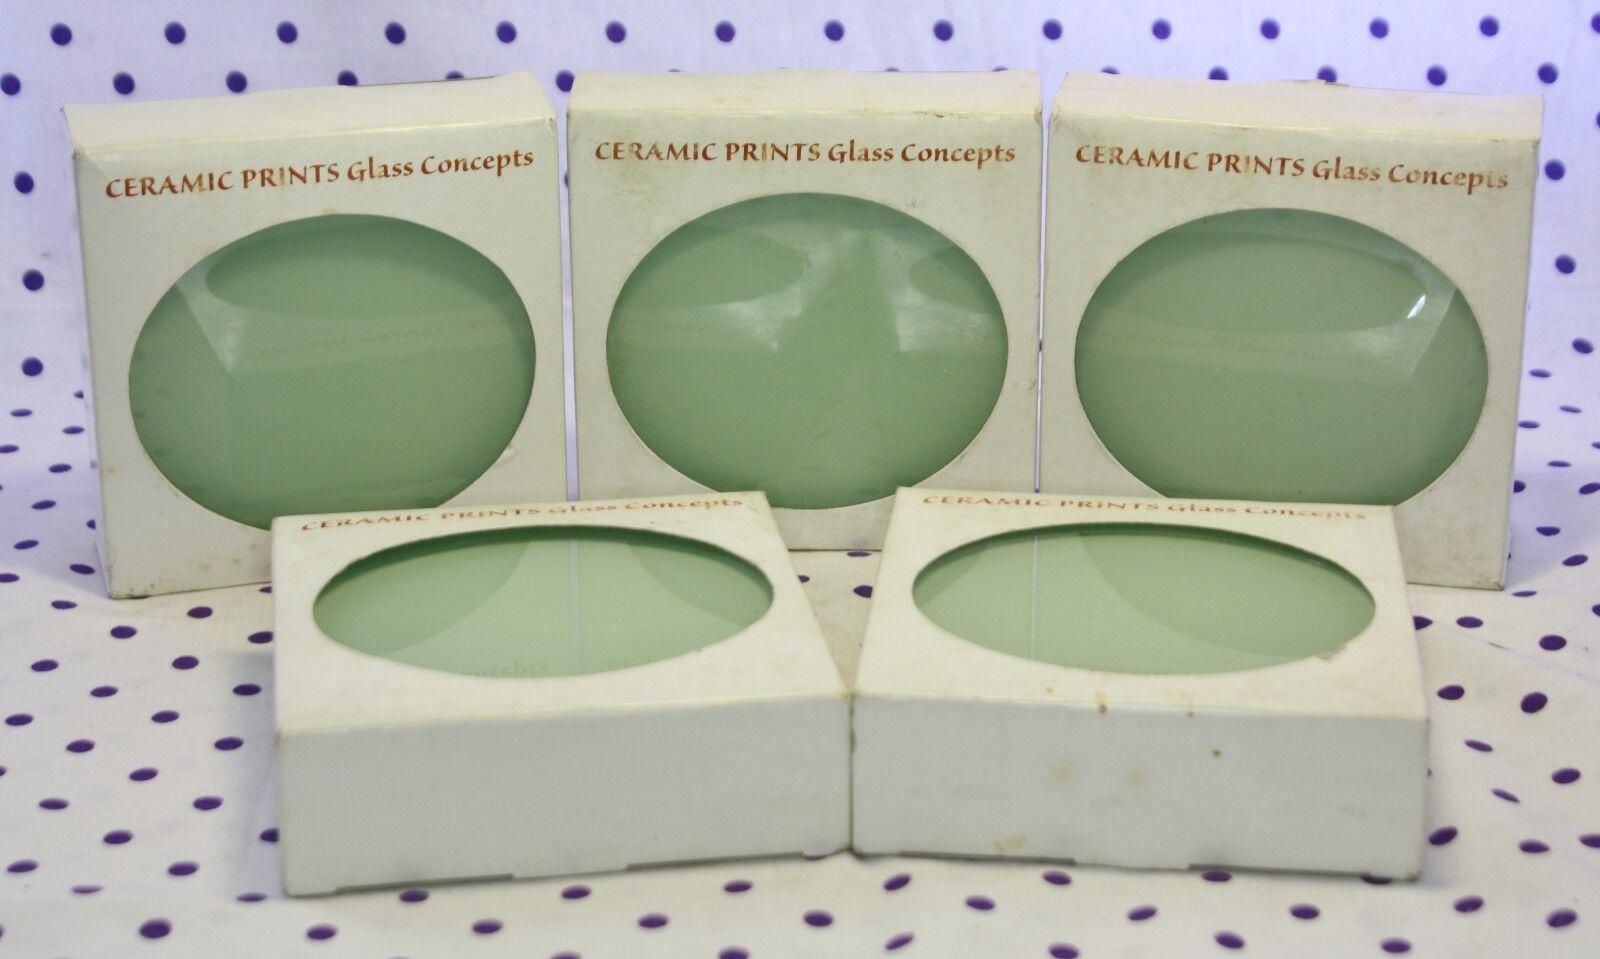 20 Ceramic Prints Glass Concepts 4.25